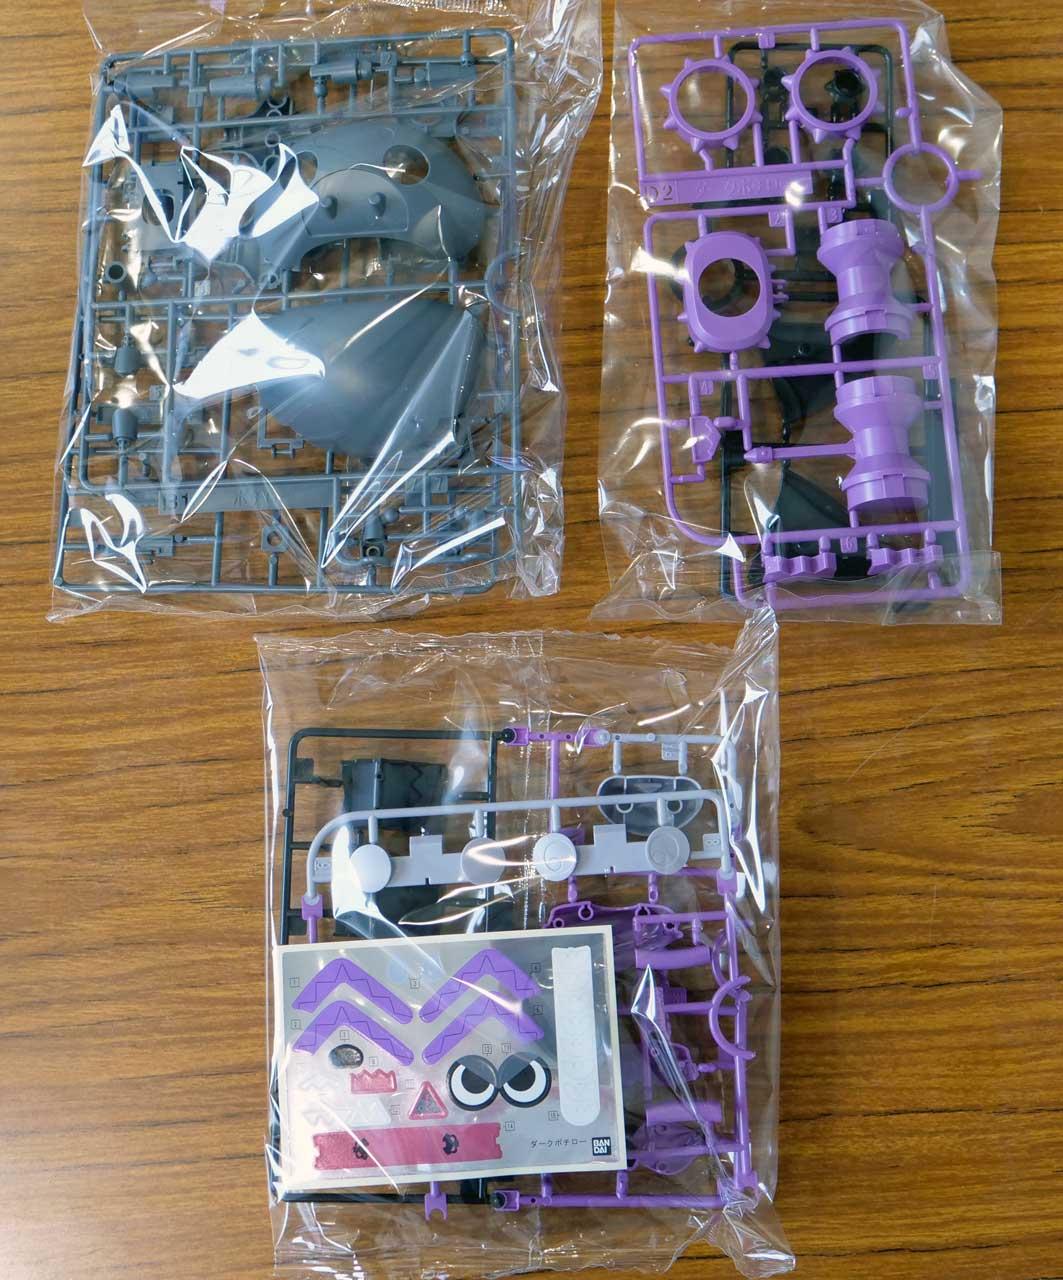 DeNA×KITERETSUの新作パズル『ピカちんキット ポチっとパズル』がWHFに出展!ダークポチローのプレゼントも!